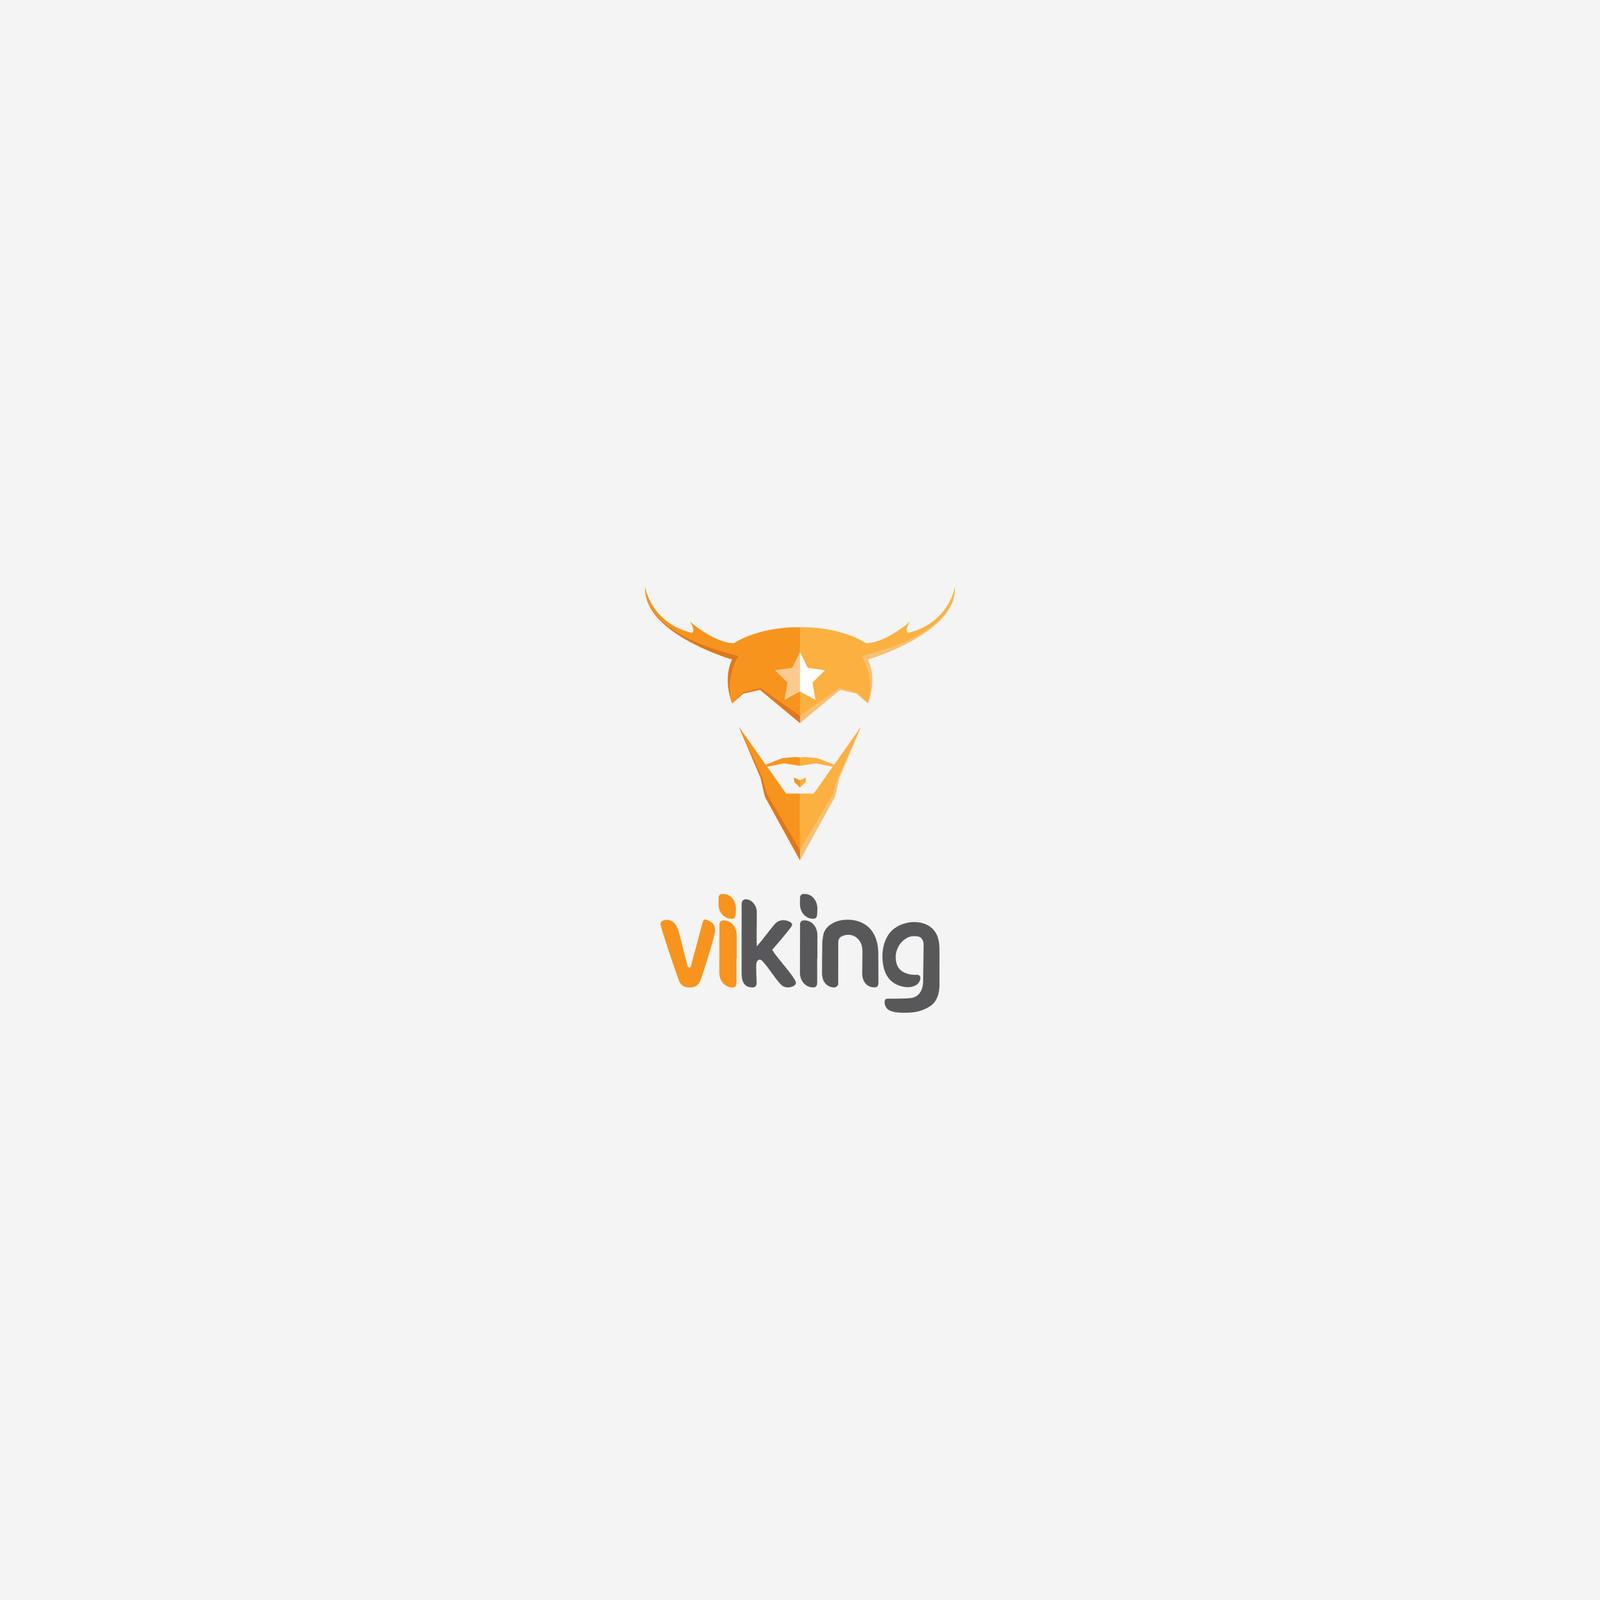 Viking minimal logo 1 by nabeelibnhassan on deviantart for Minimal art logo